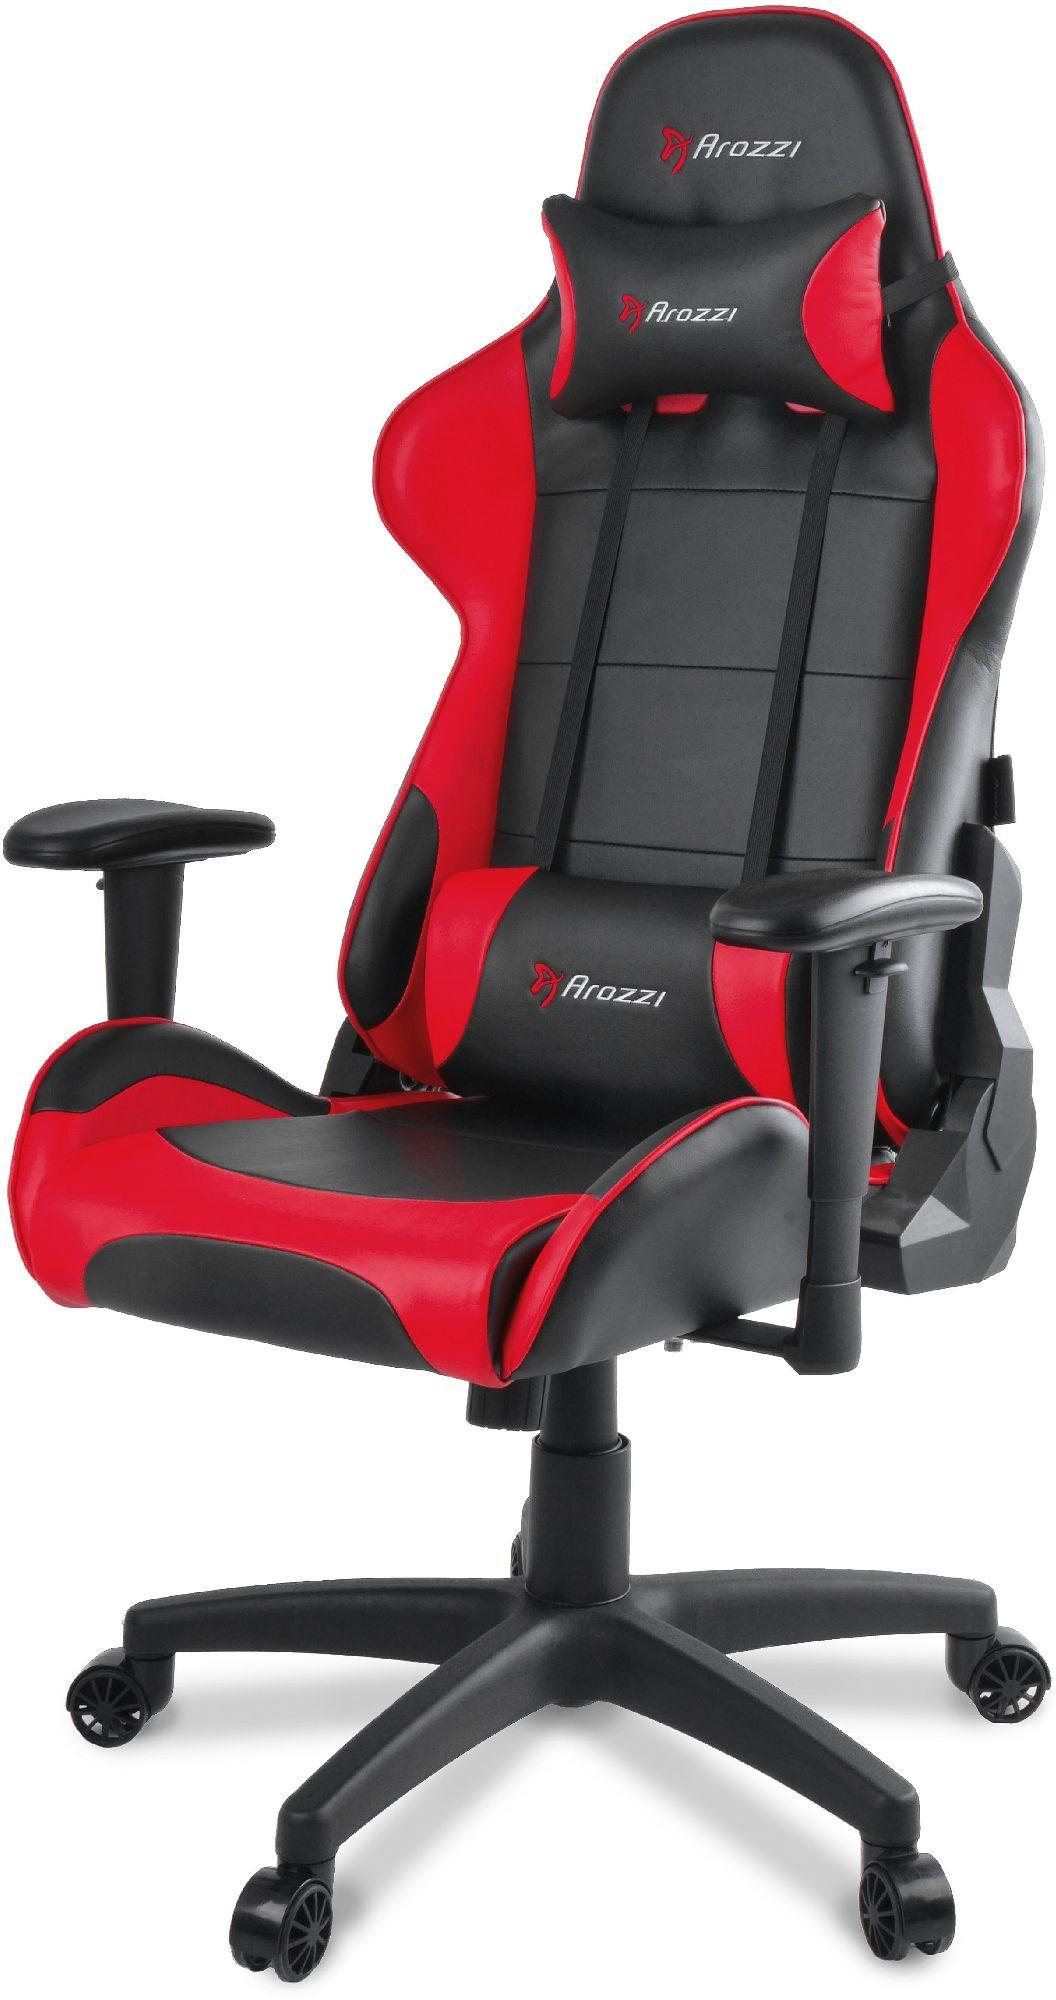 AROZZI Arozzi Verona Gaming Chair V2 VERONA-V2-RD black/red